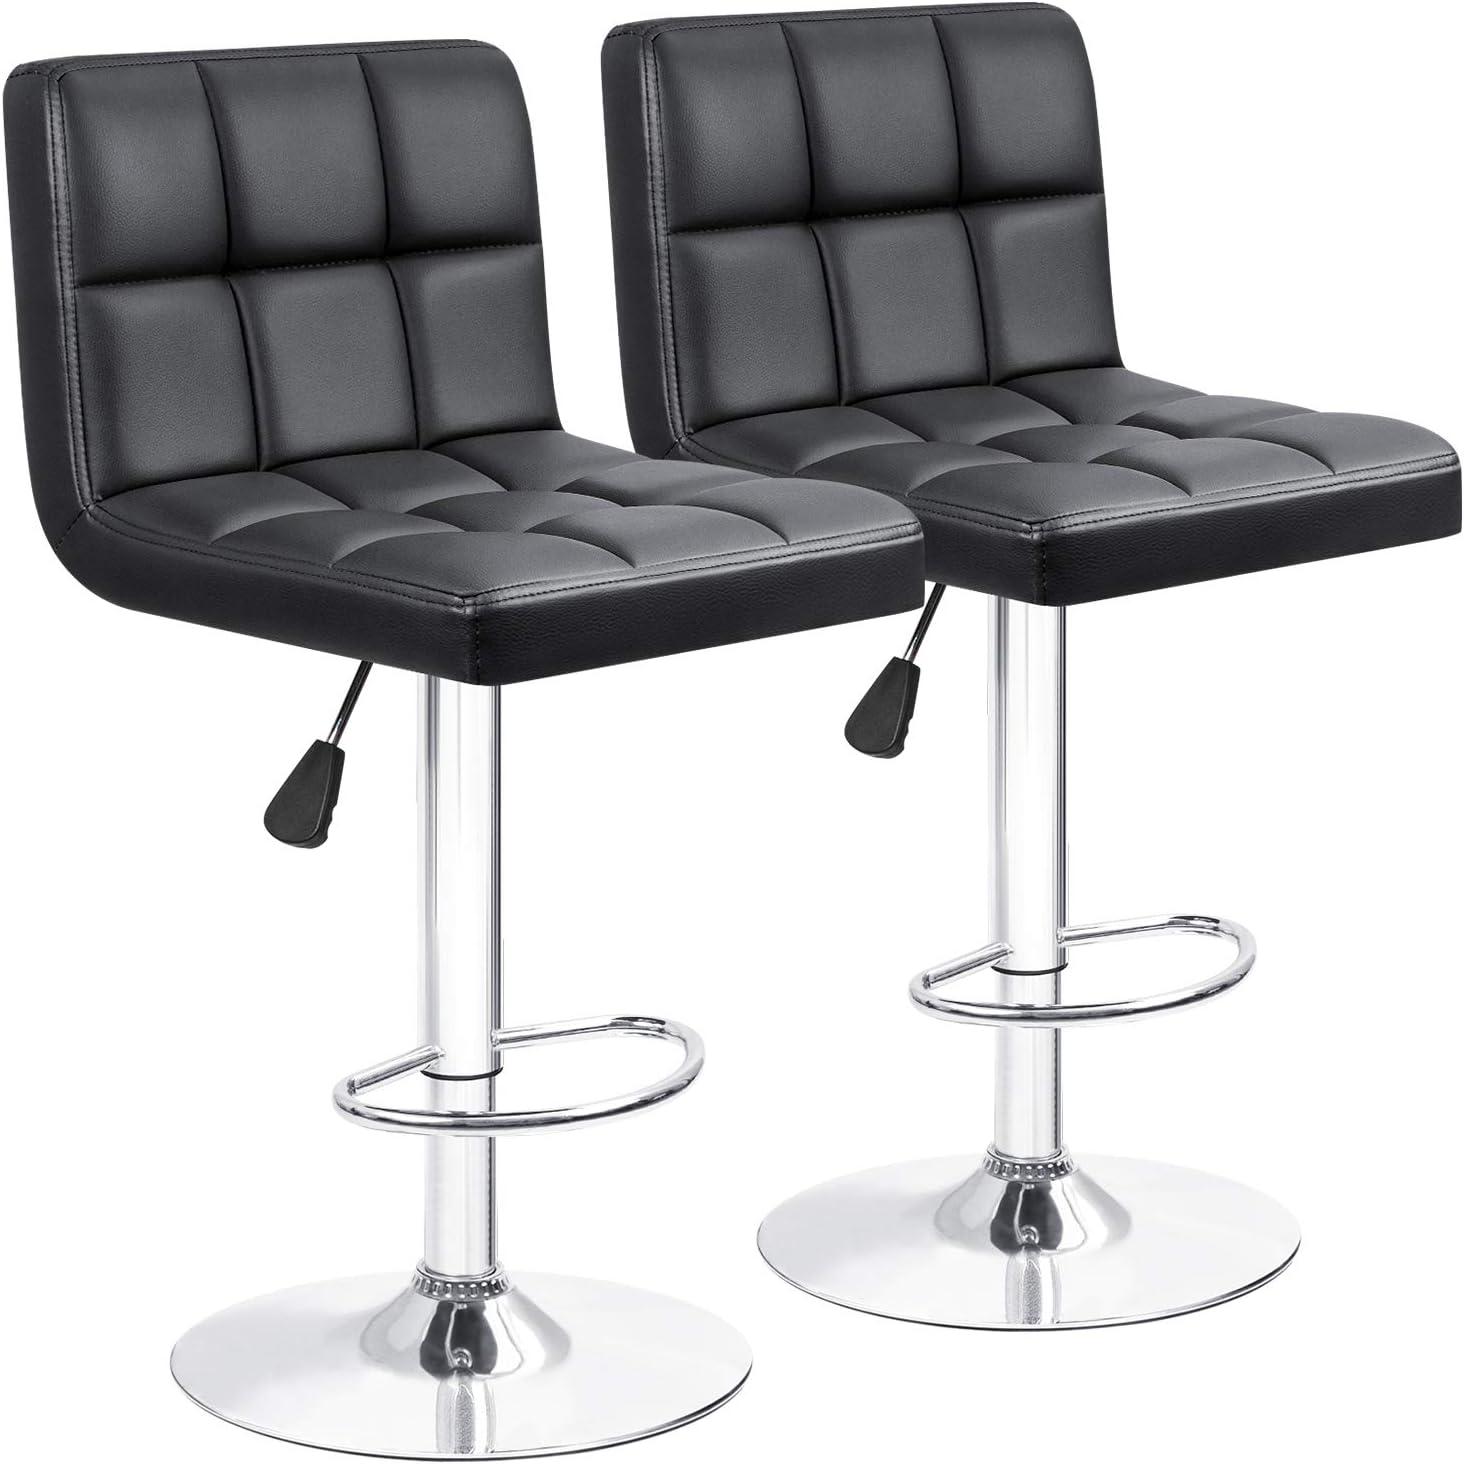 Bar Stools Barstools Modern Square PU Leather Adjustable Barstool, Armless  Counter Height Swivel Bar Stool with Back Set of 12 Black